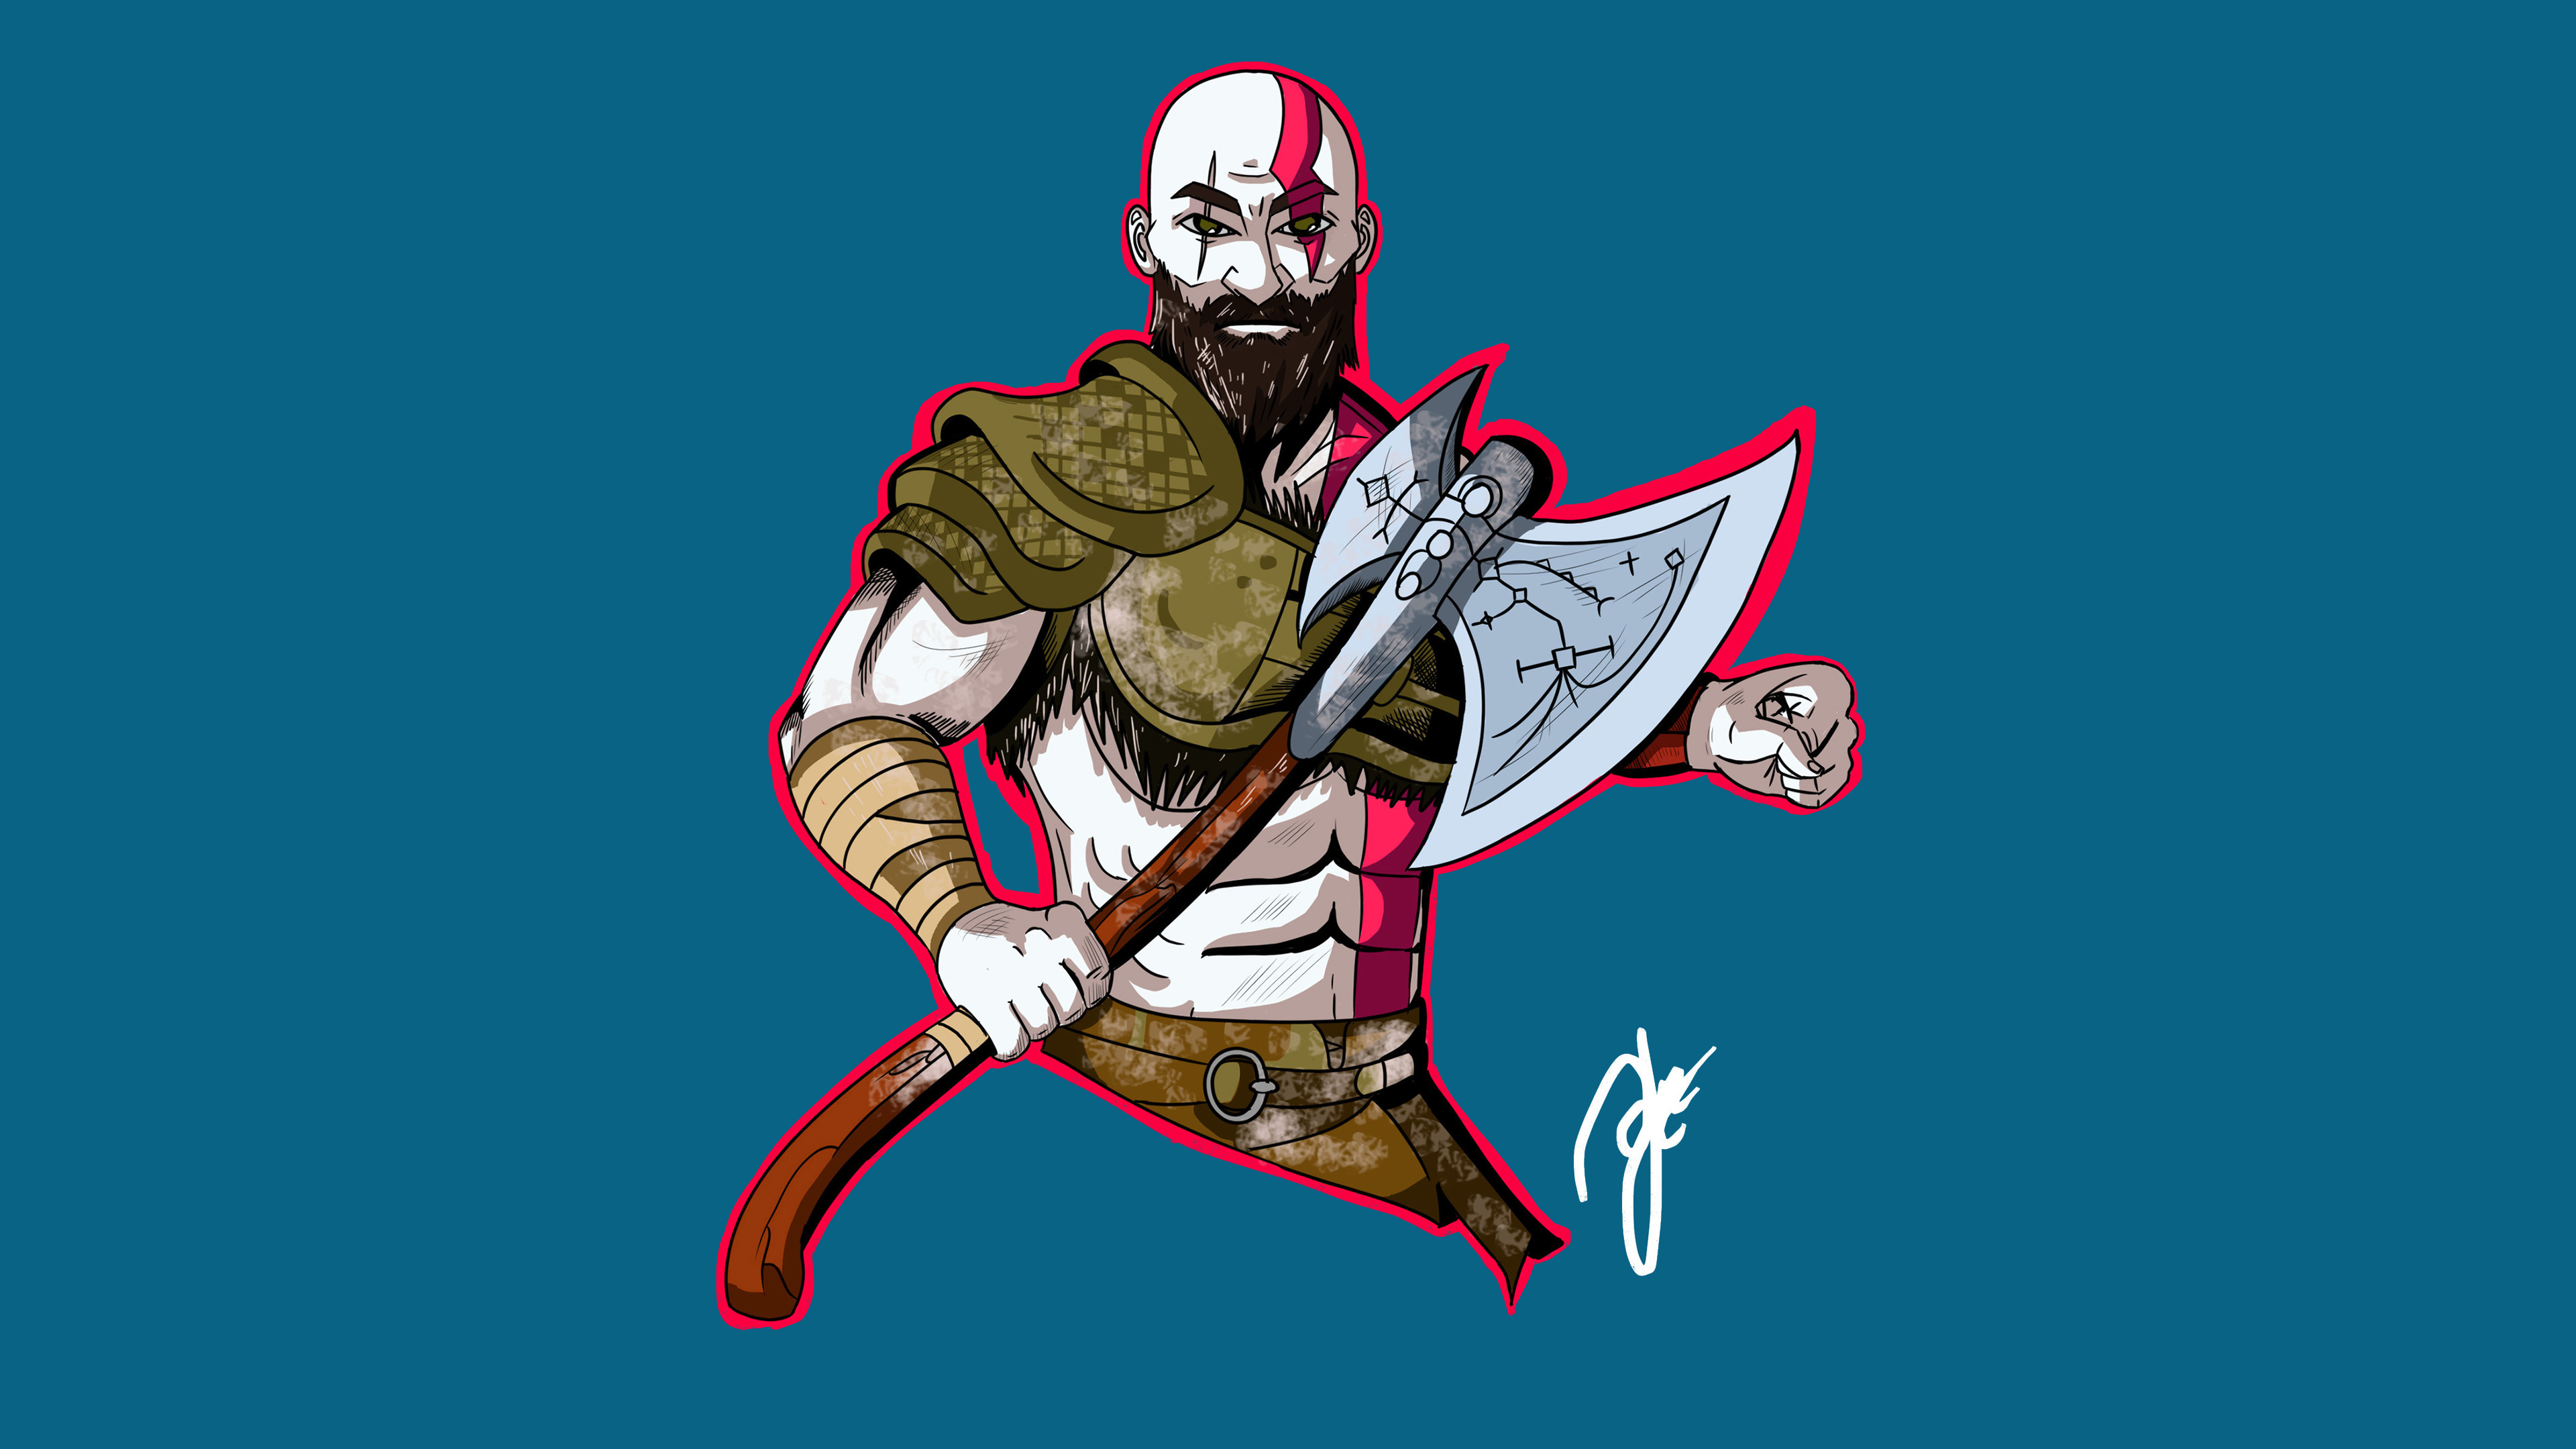 kratos-god-of-war-artwork-4k-7m.jpg